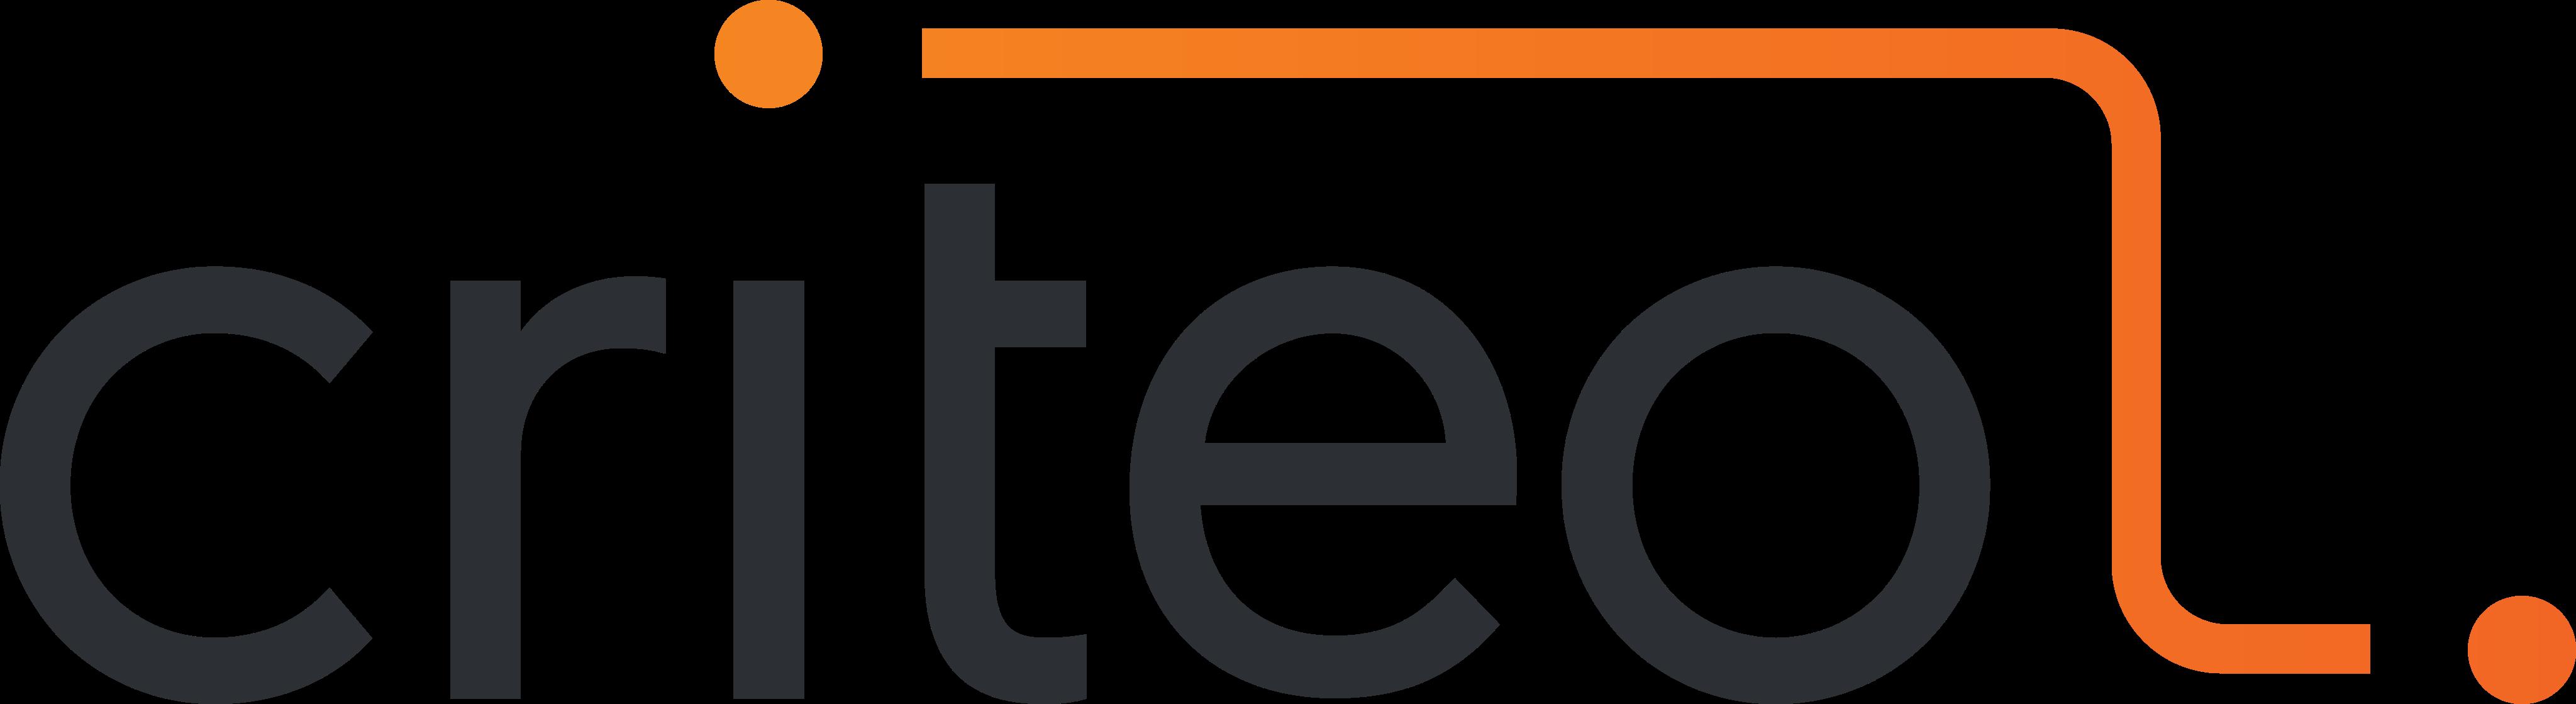 criteo logo - Criteo Logo